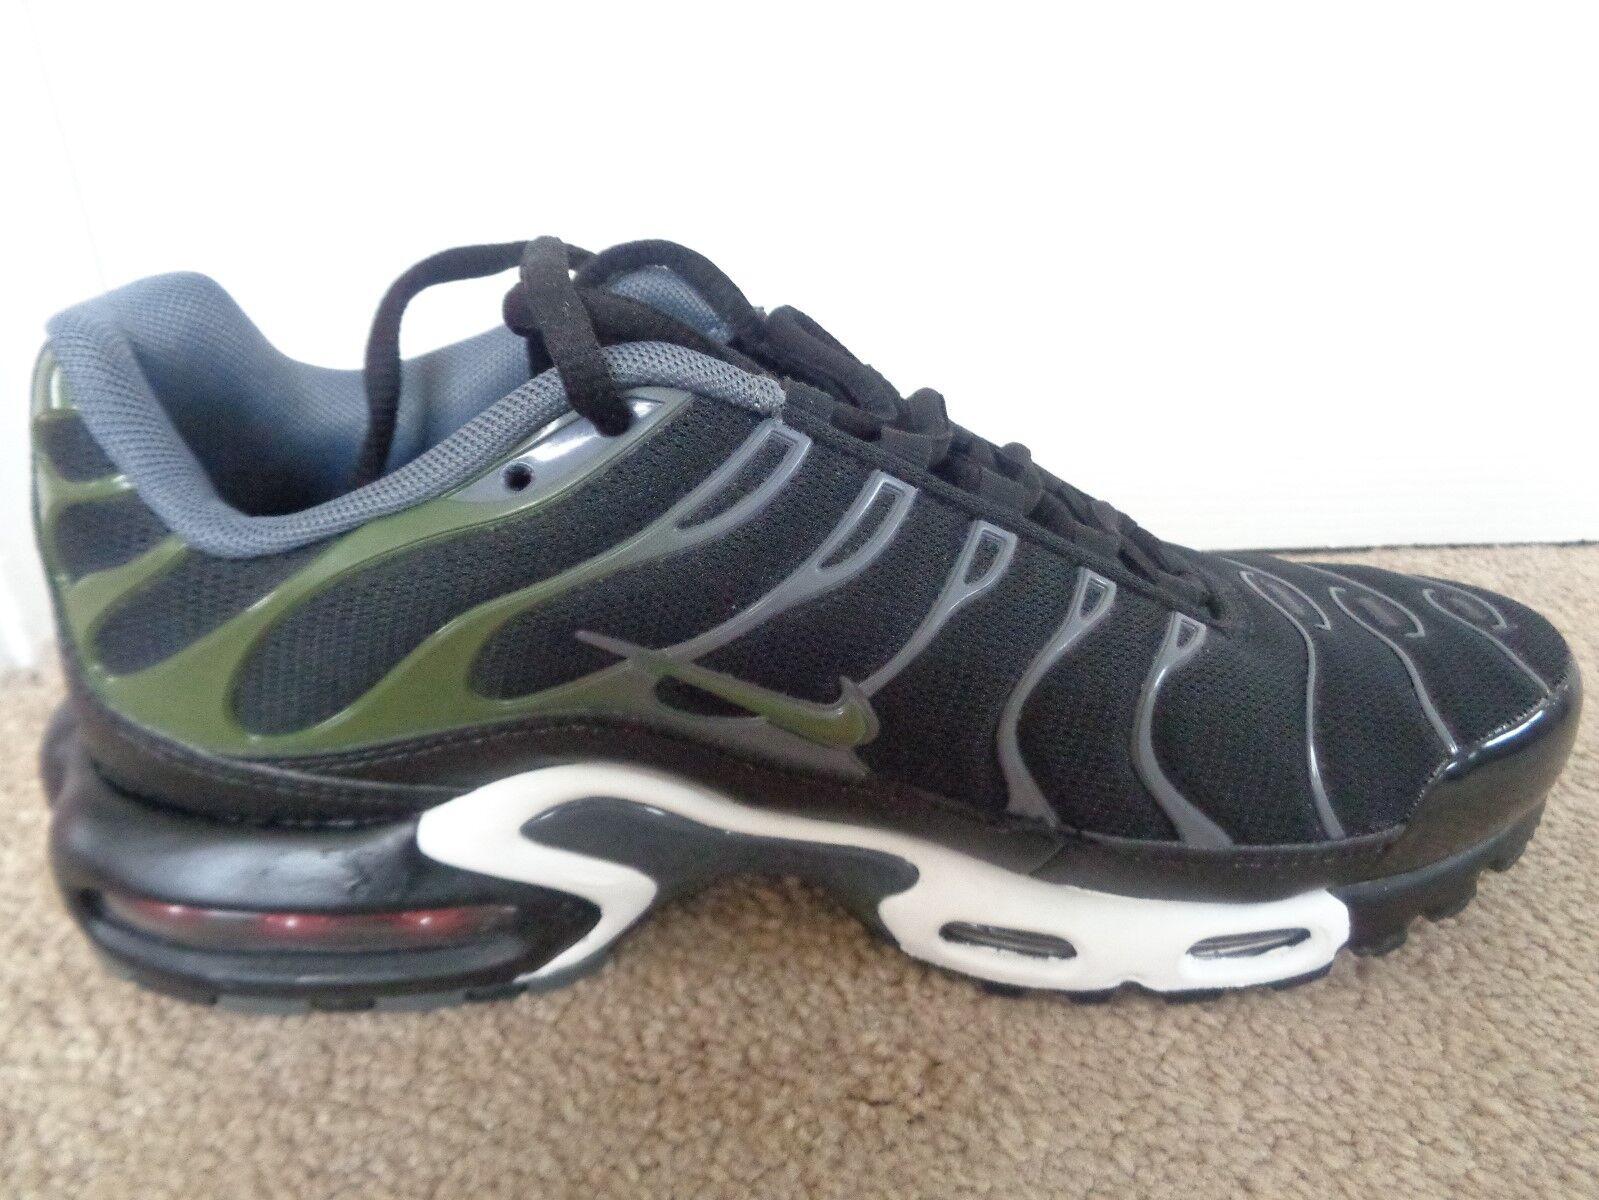 Nike sneakers Air max plus trainers sneakers Nike shoes 852630 007 uk 6 eu 40 us 7 NEW+BOX e40afb